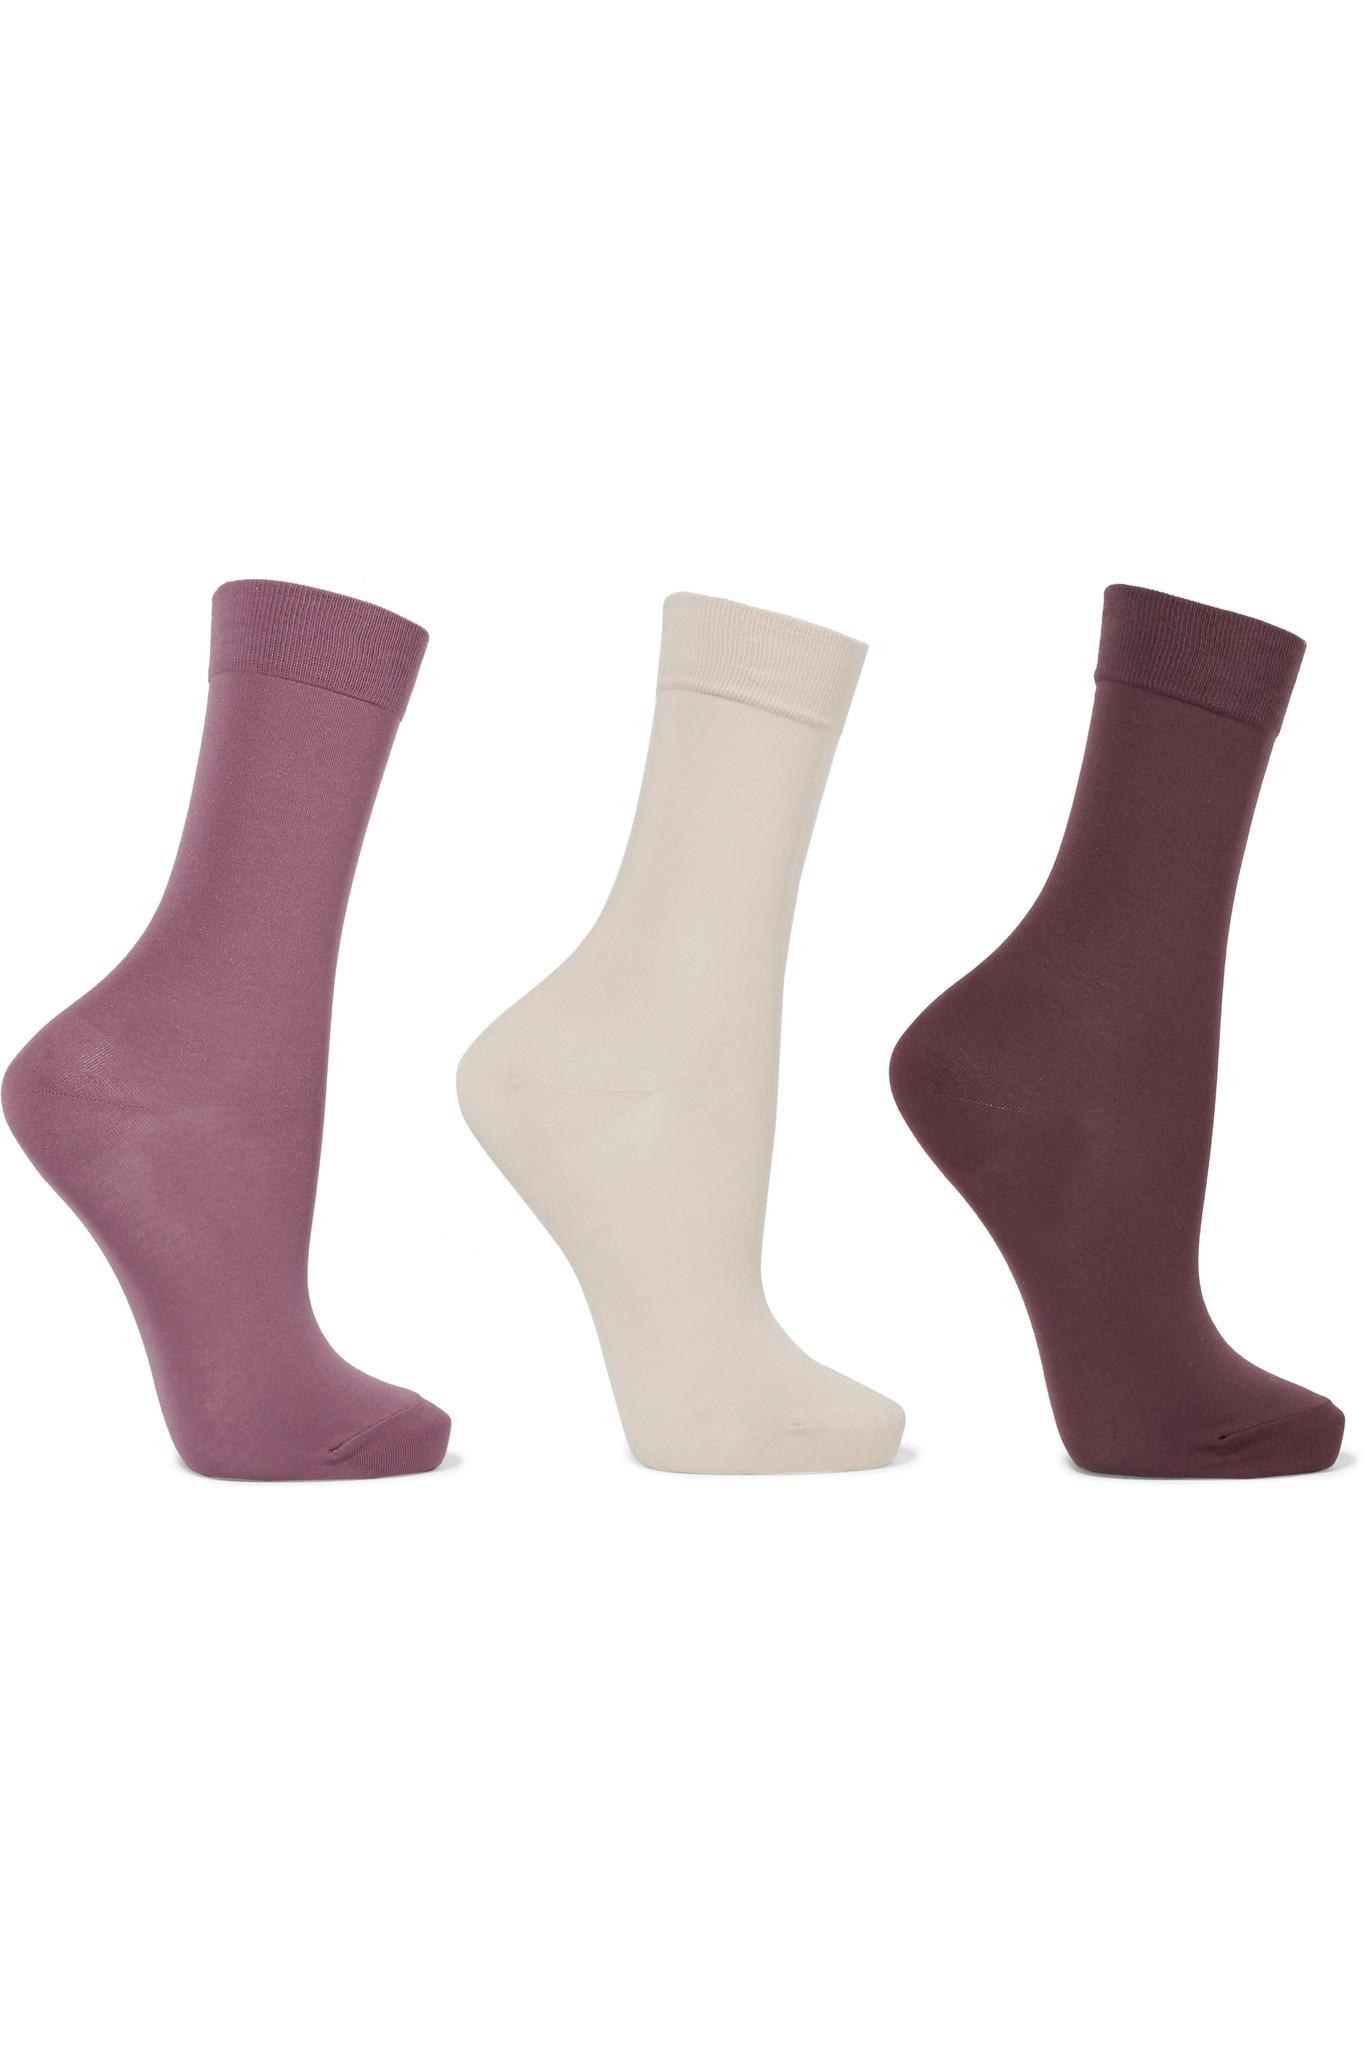 Set Of Three Cotton-blend Socks - Black Falke Cheap Price Cost Big Sale Cheap Sale Buy Perfect 712THrmF